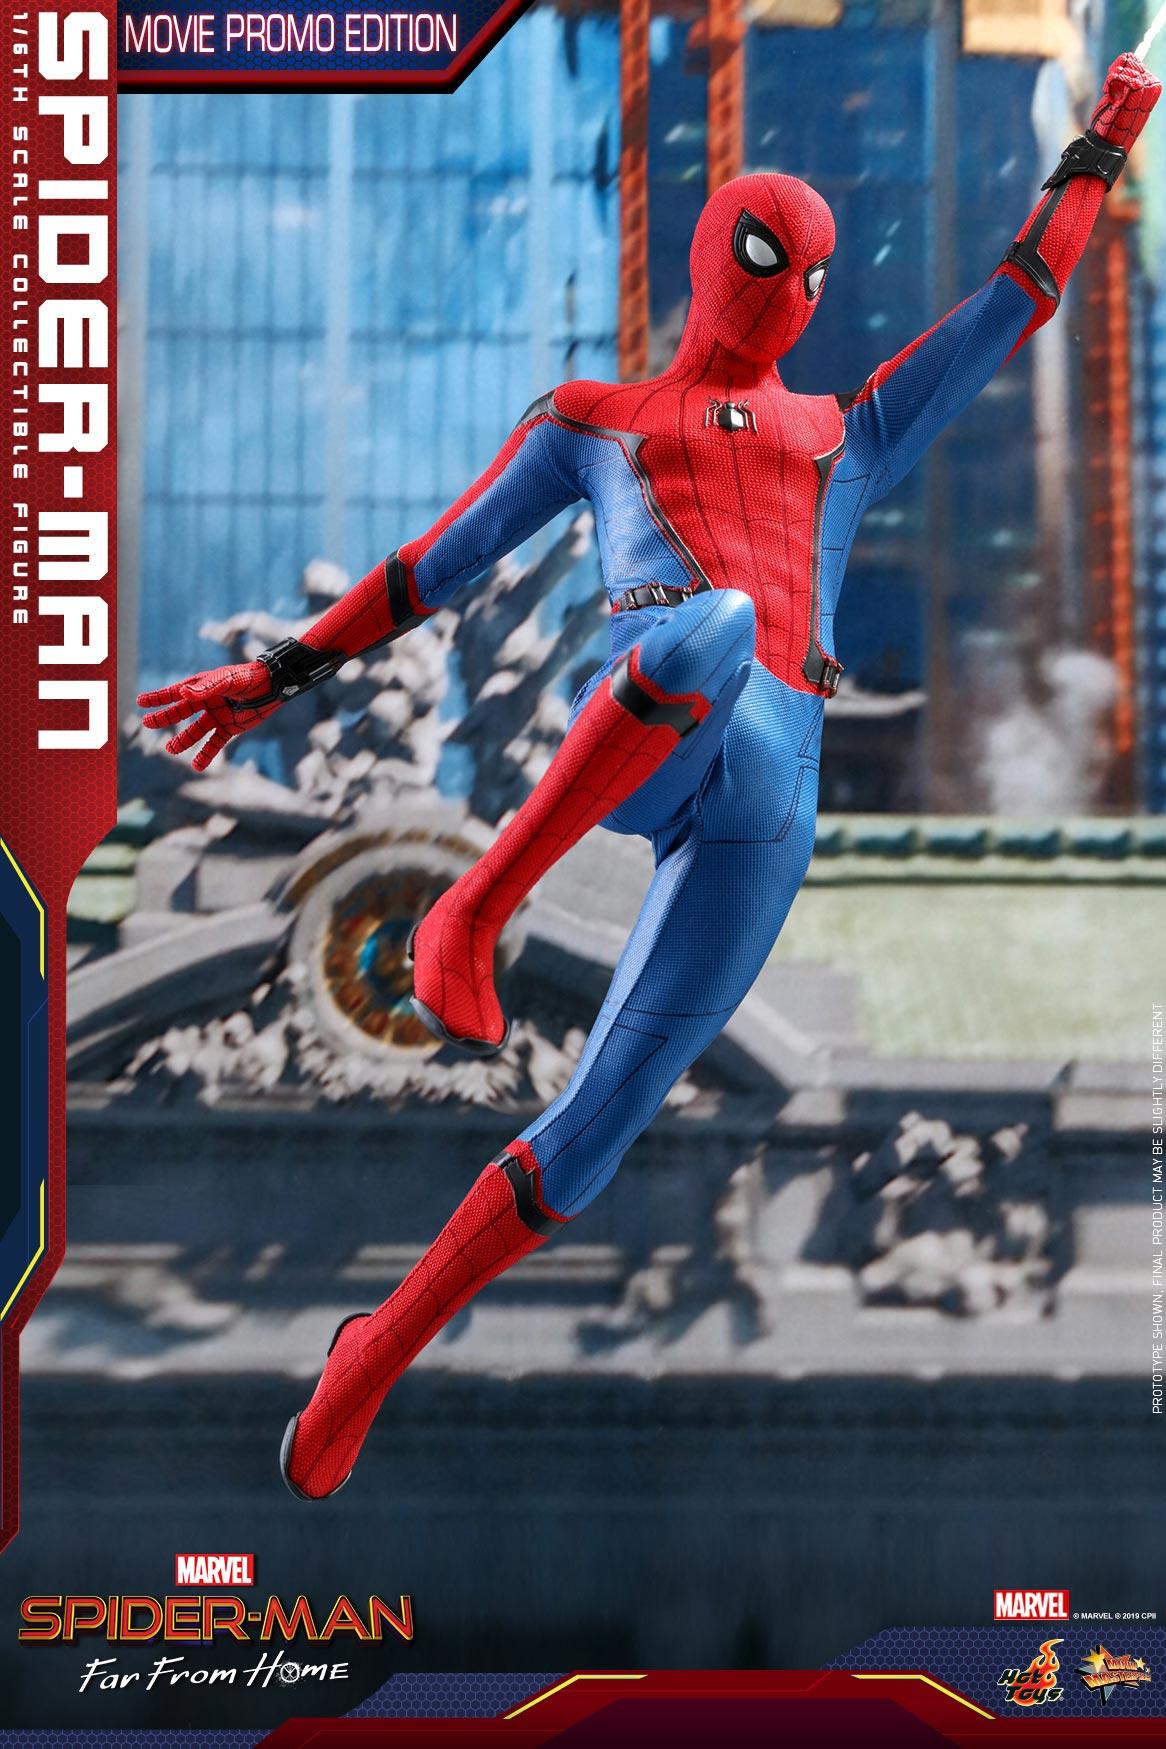 Hot-Toys---SMFFH---Spider-Man-(Movie-Promo-Edition)-collectible-figure_PR3